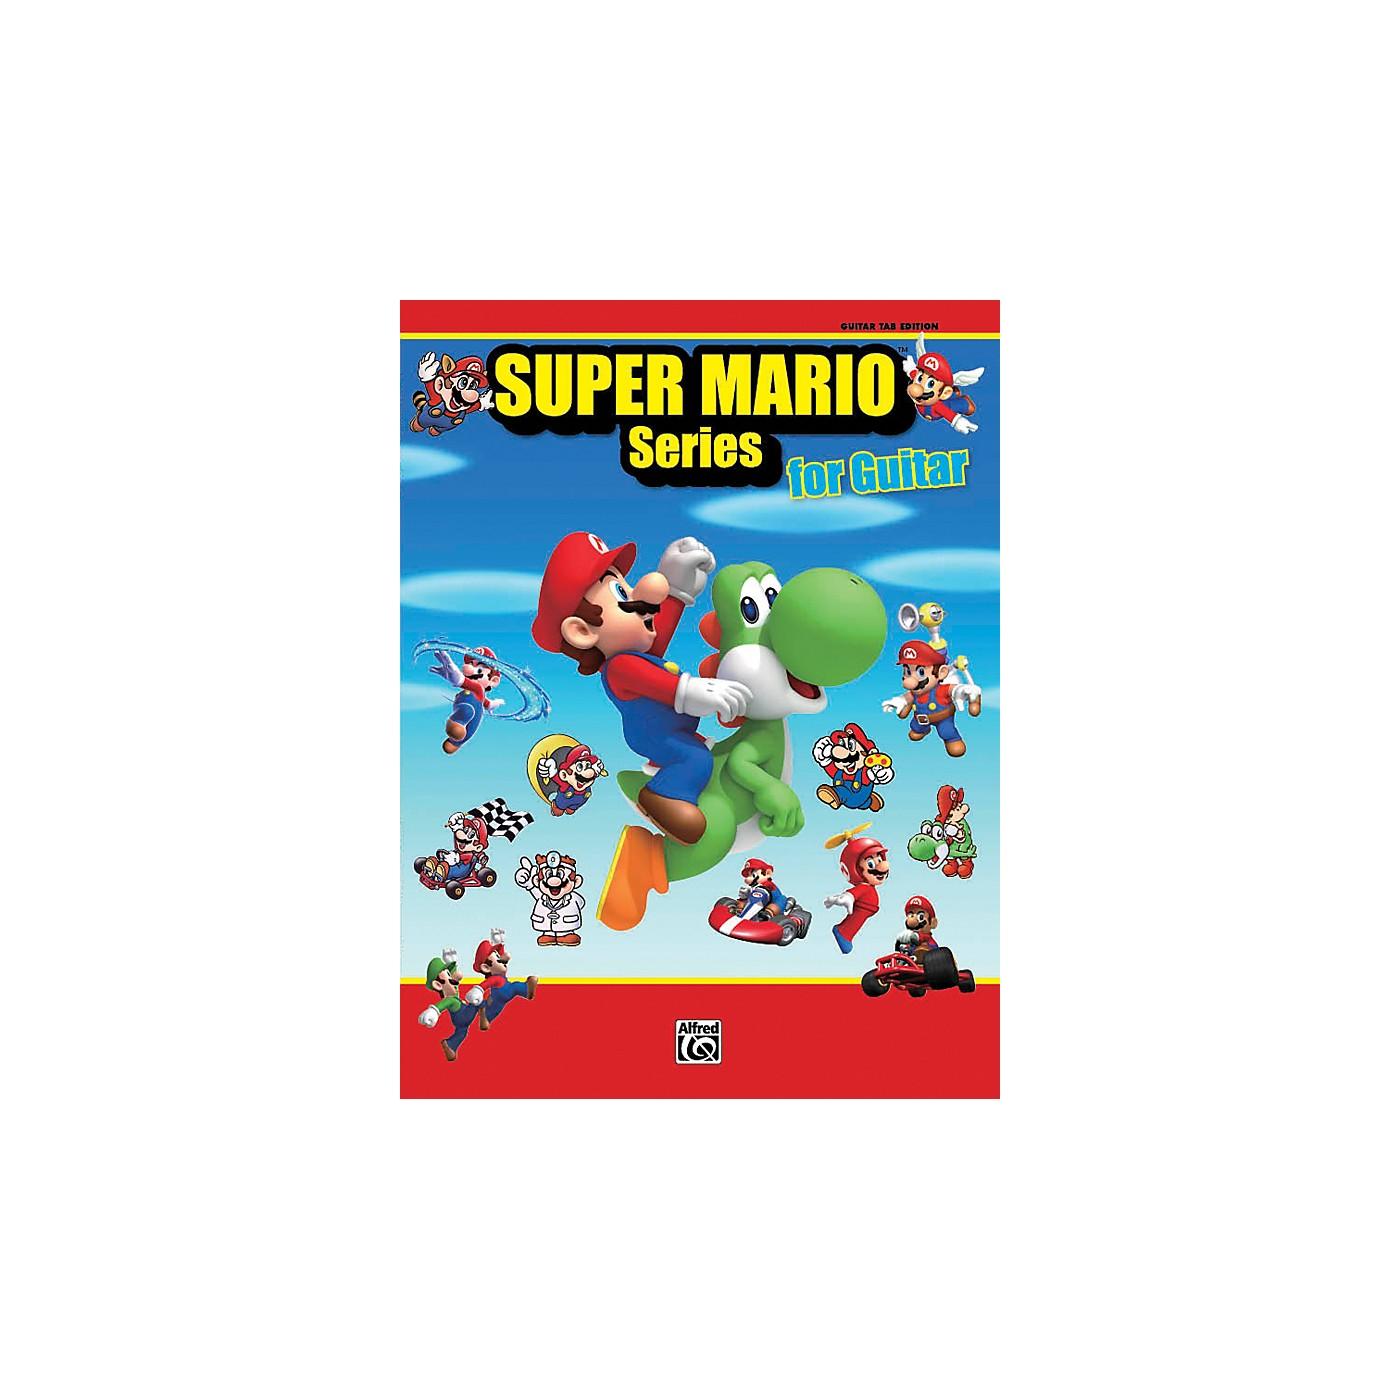 Alfred Super Mario Series for Guitar Book thumbnail